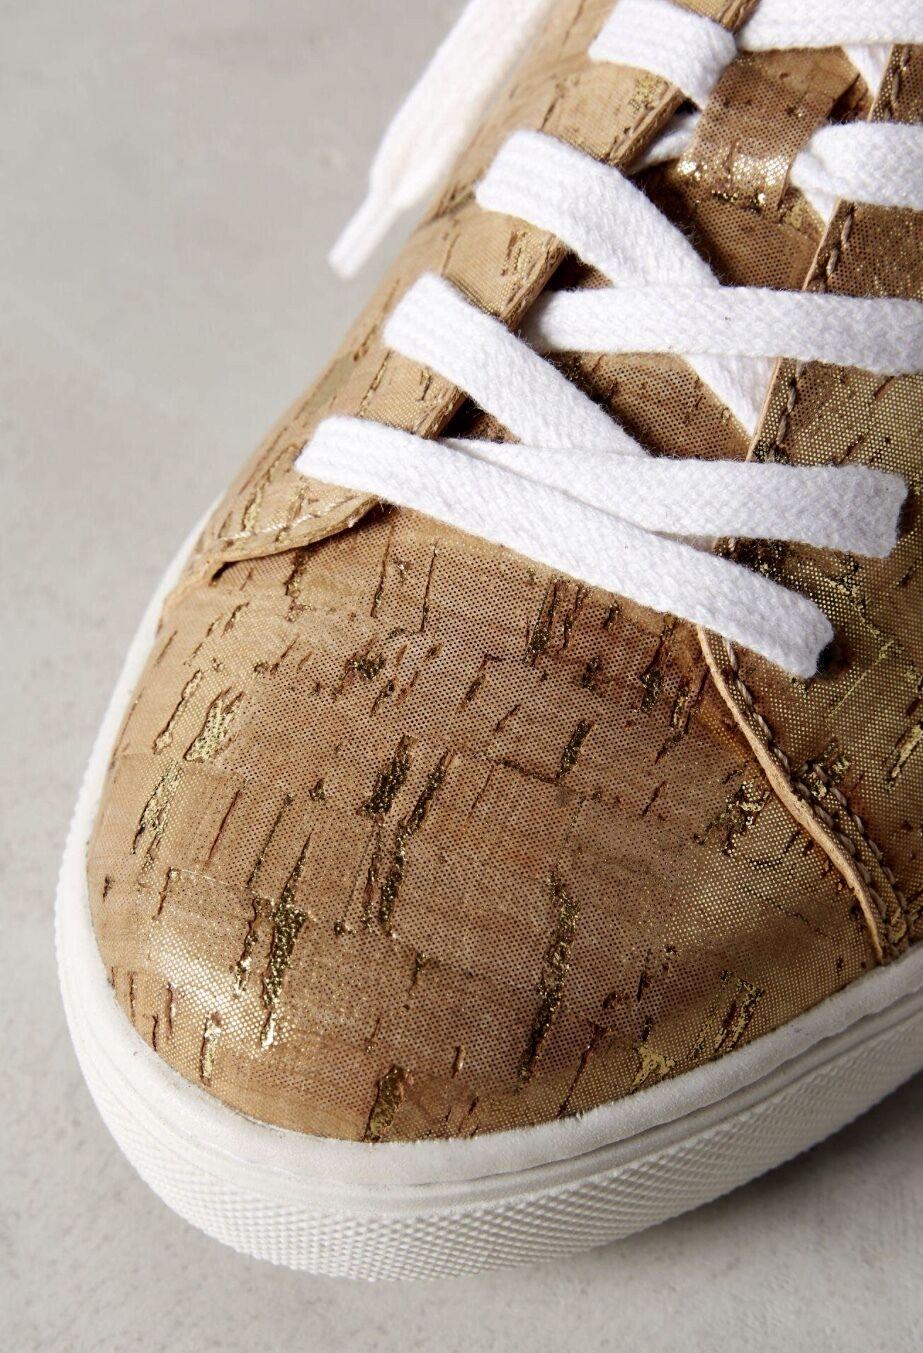 NIB Anthropologie Raphaella Booz Booz Booz Gold Metallic Cork Lace Up Sneakers 8 28da27